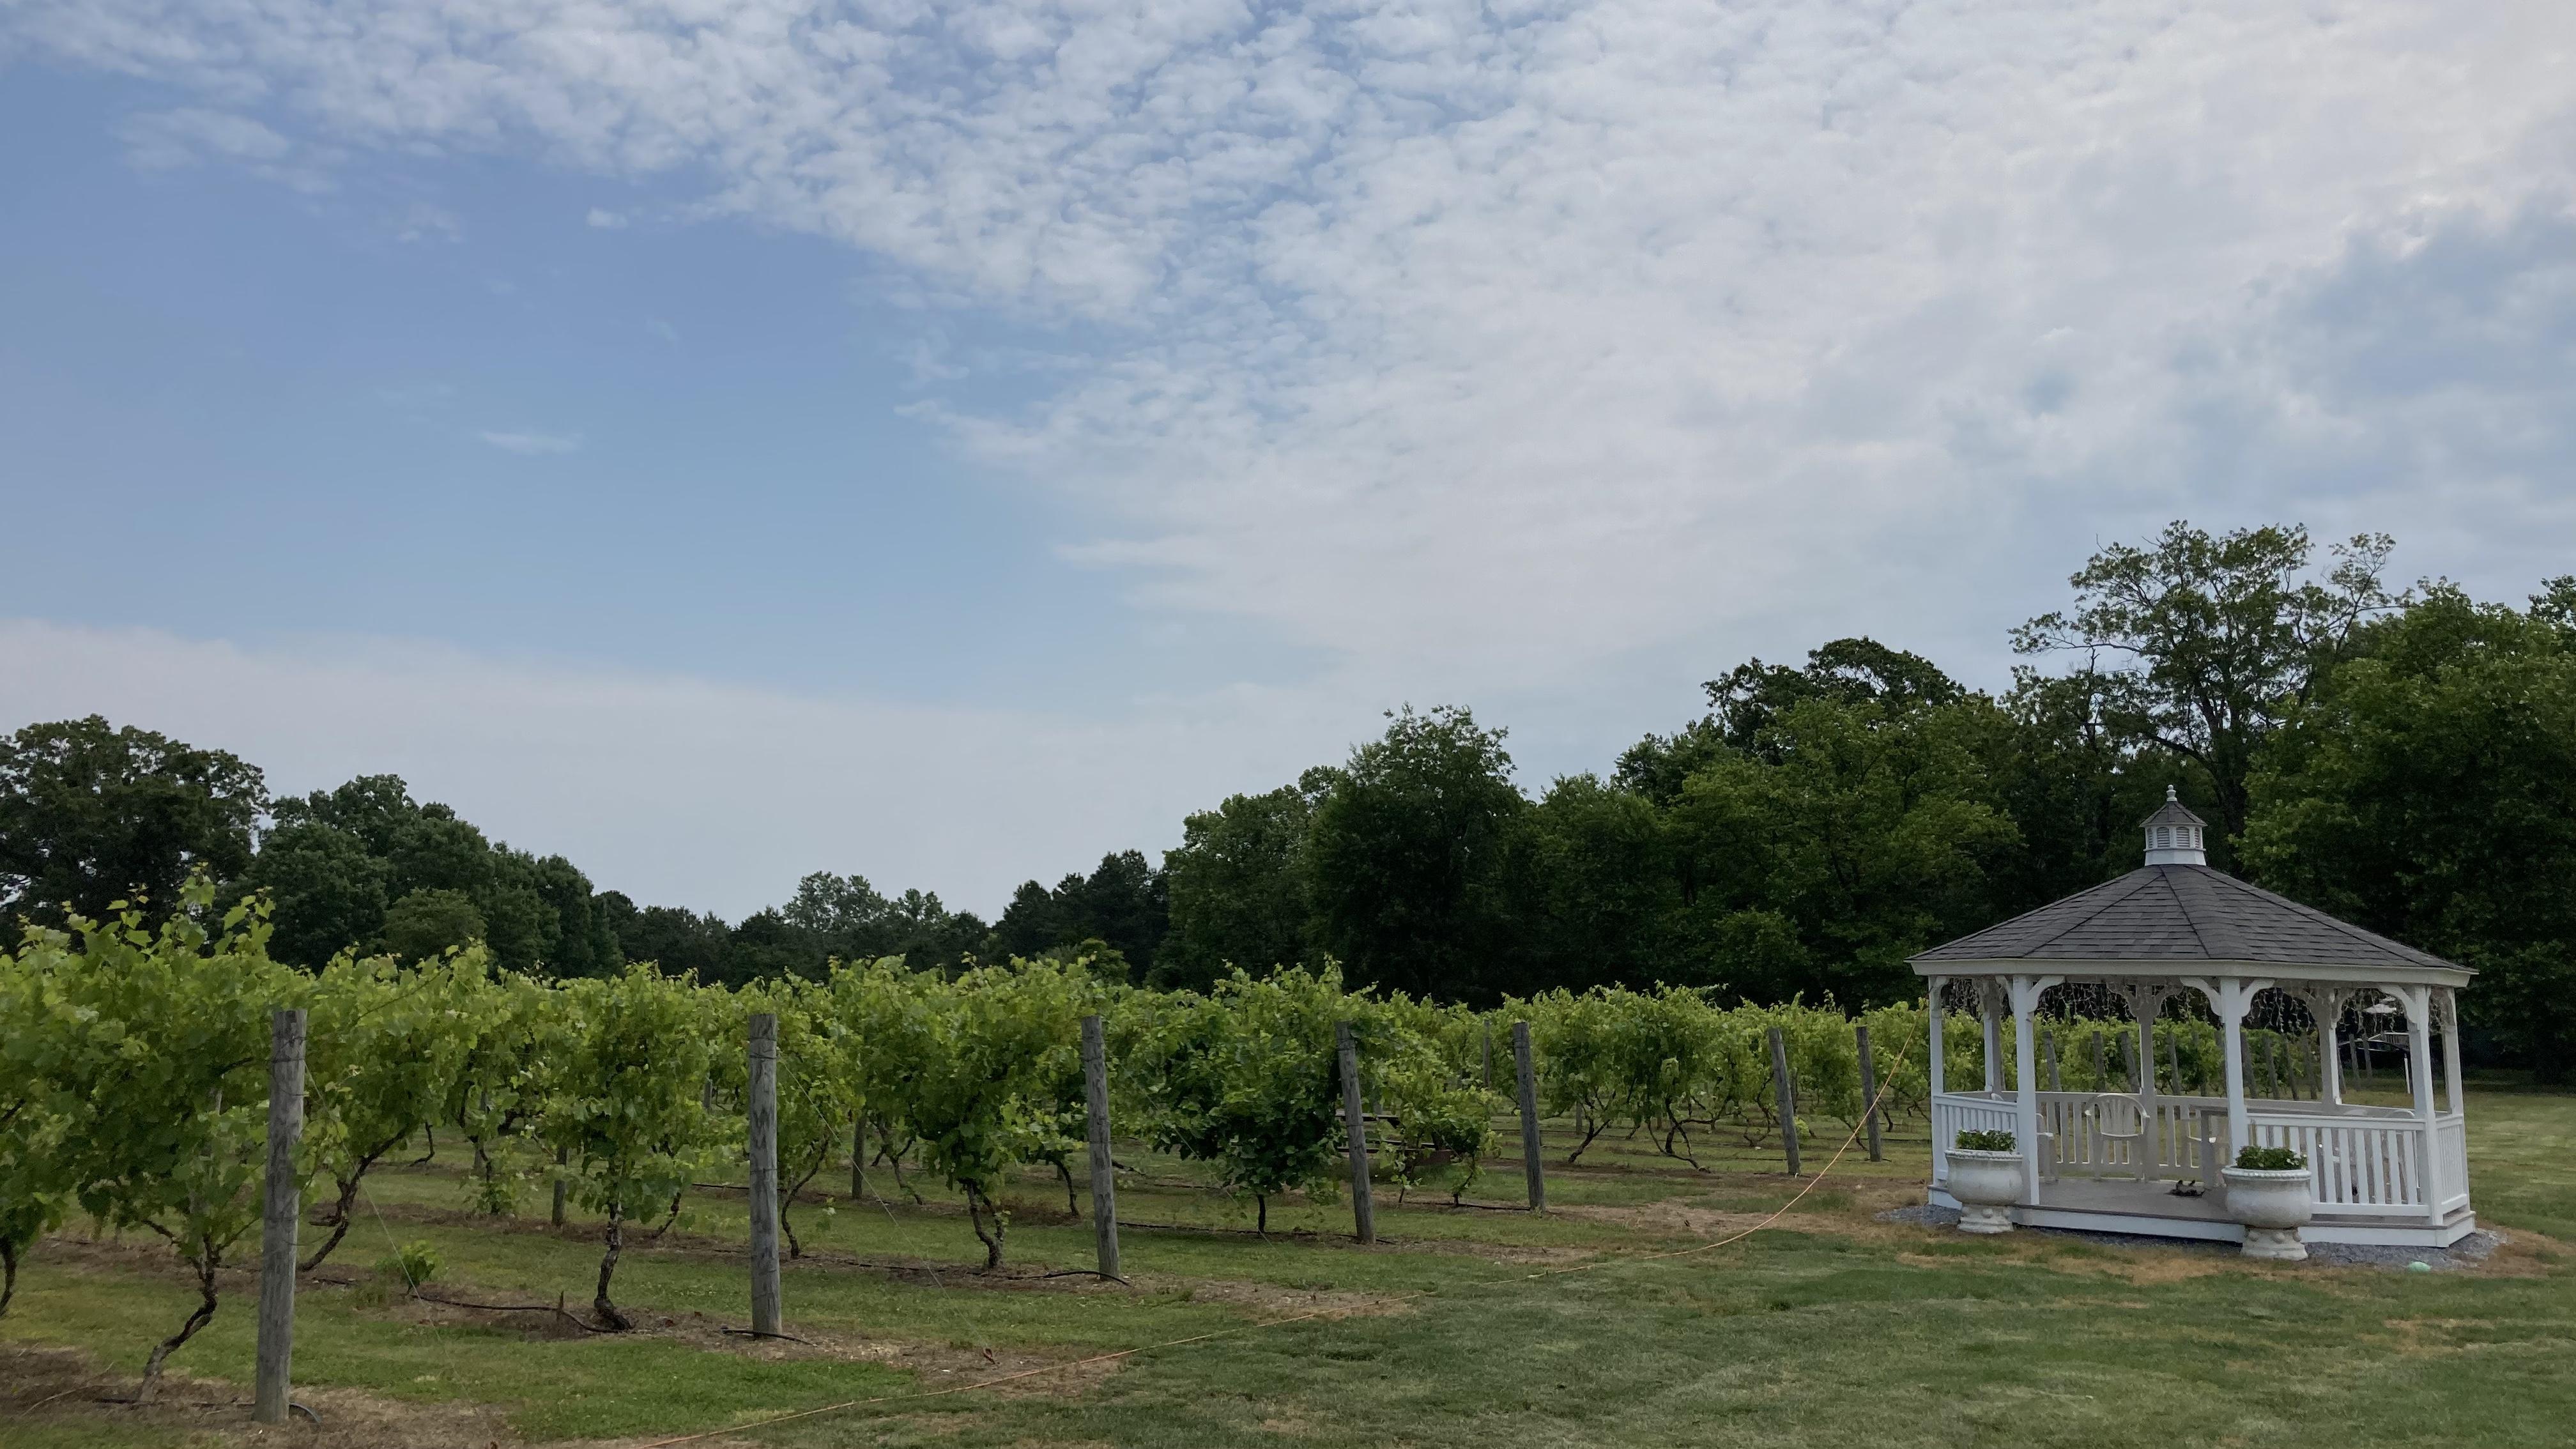 Vineyard with small white gazebo.